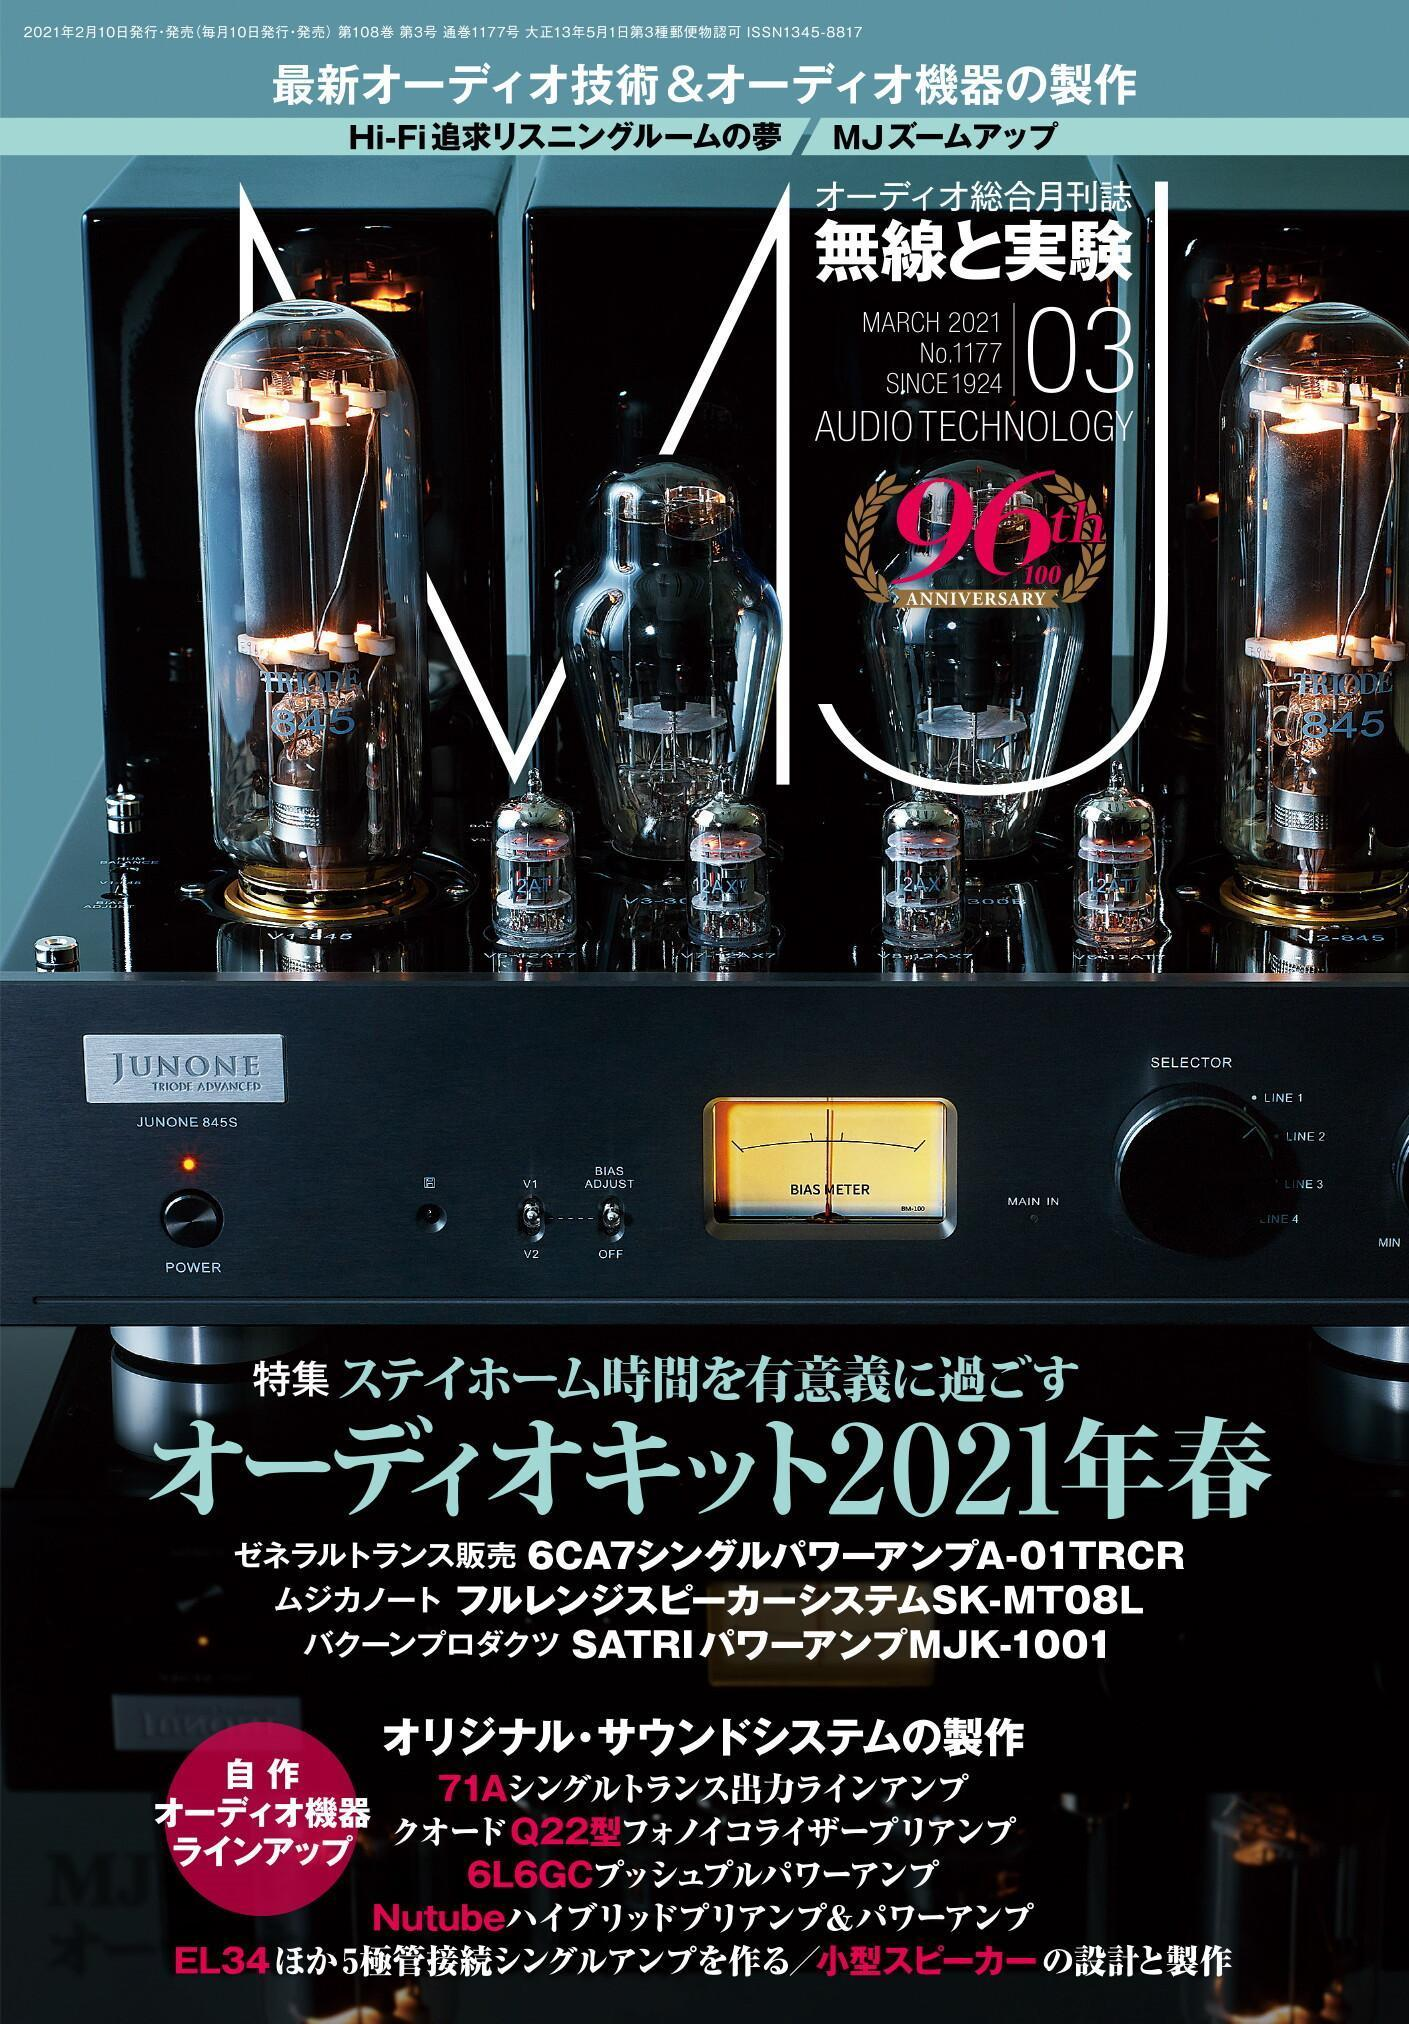 MJ 無線と実験 – 3月 2021